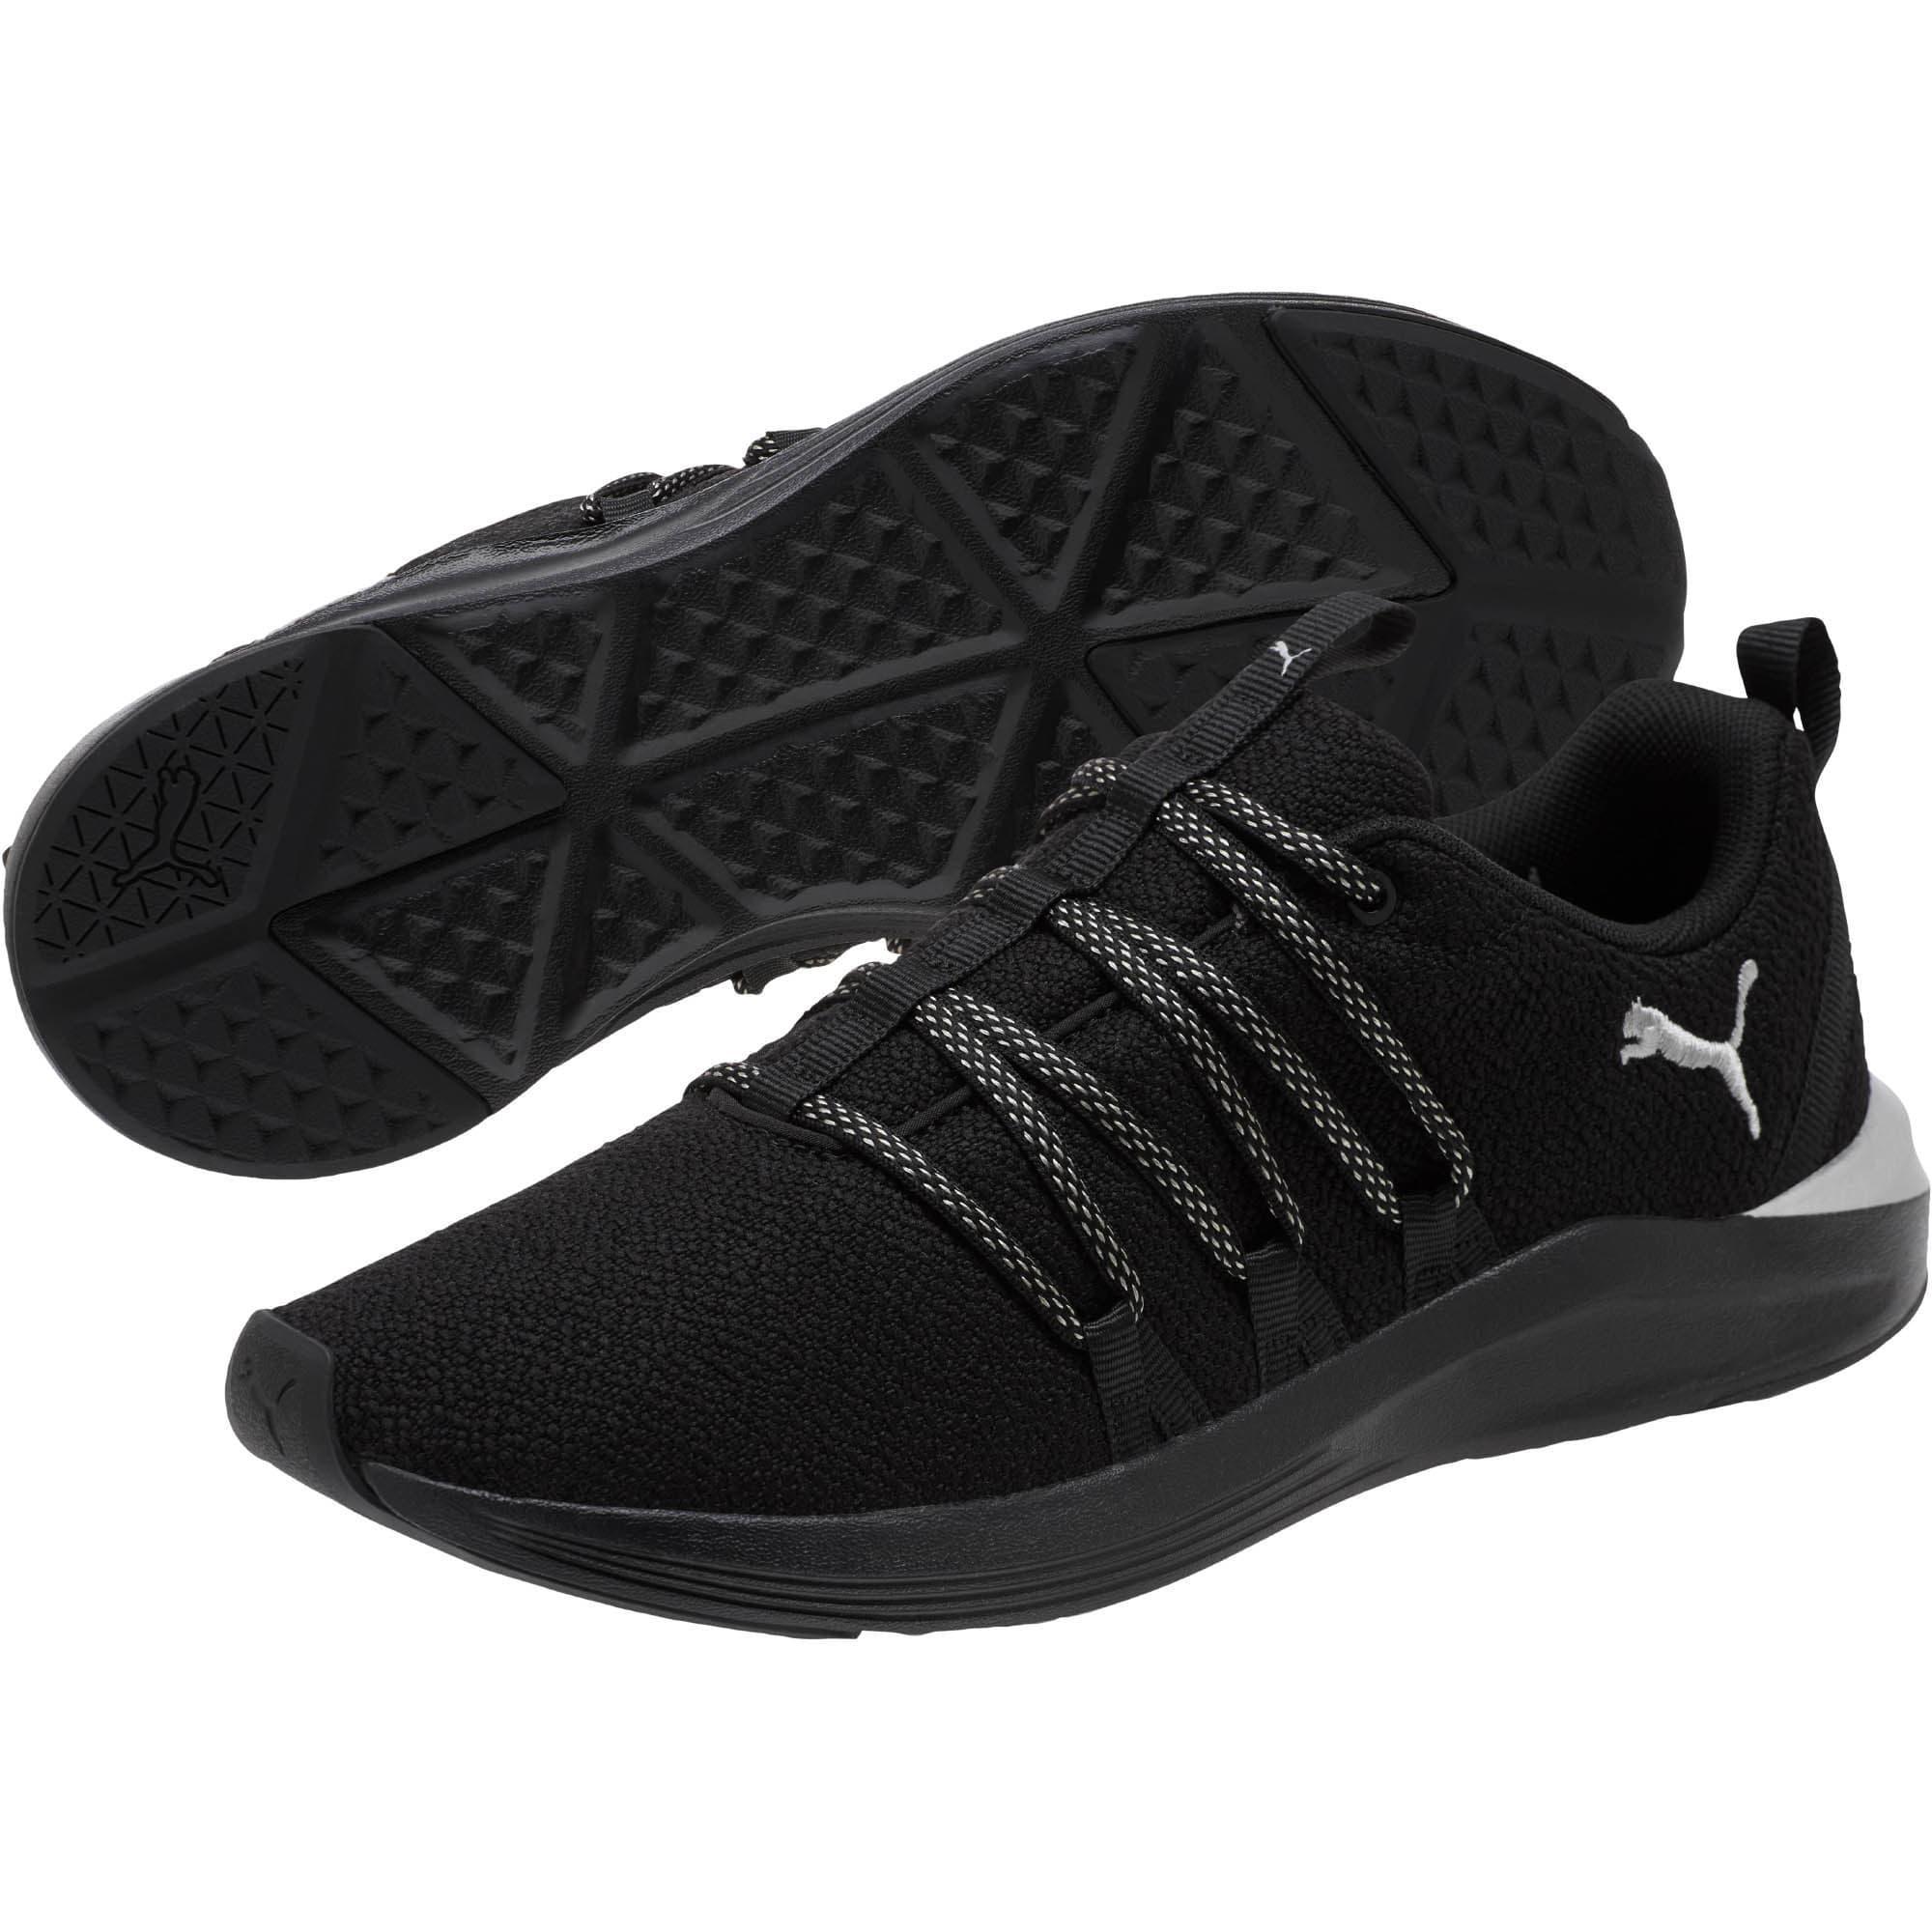 PUMA Prowl Alt Prem Mesh Women's Training Shoes in Black - Lyst